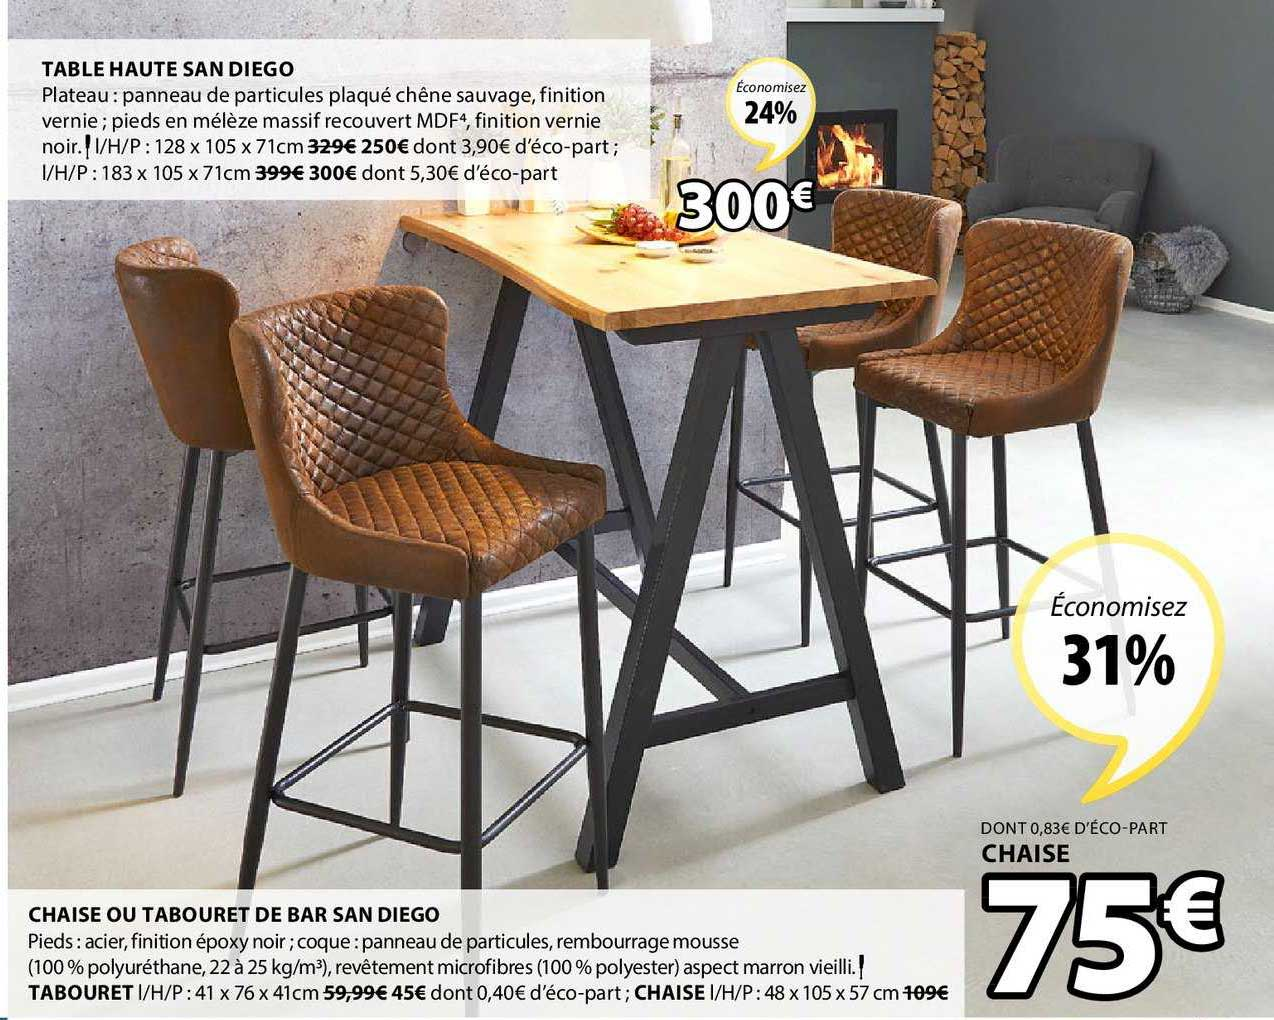 offre table haute san diego chaise ou